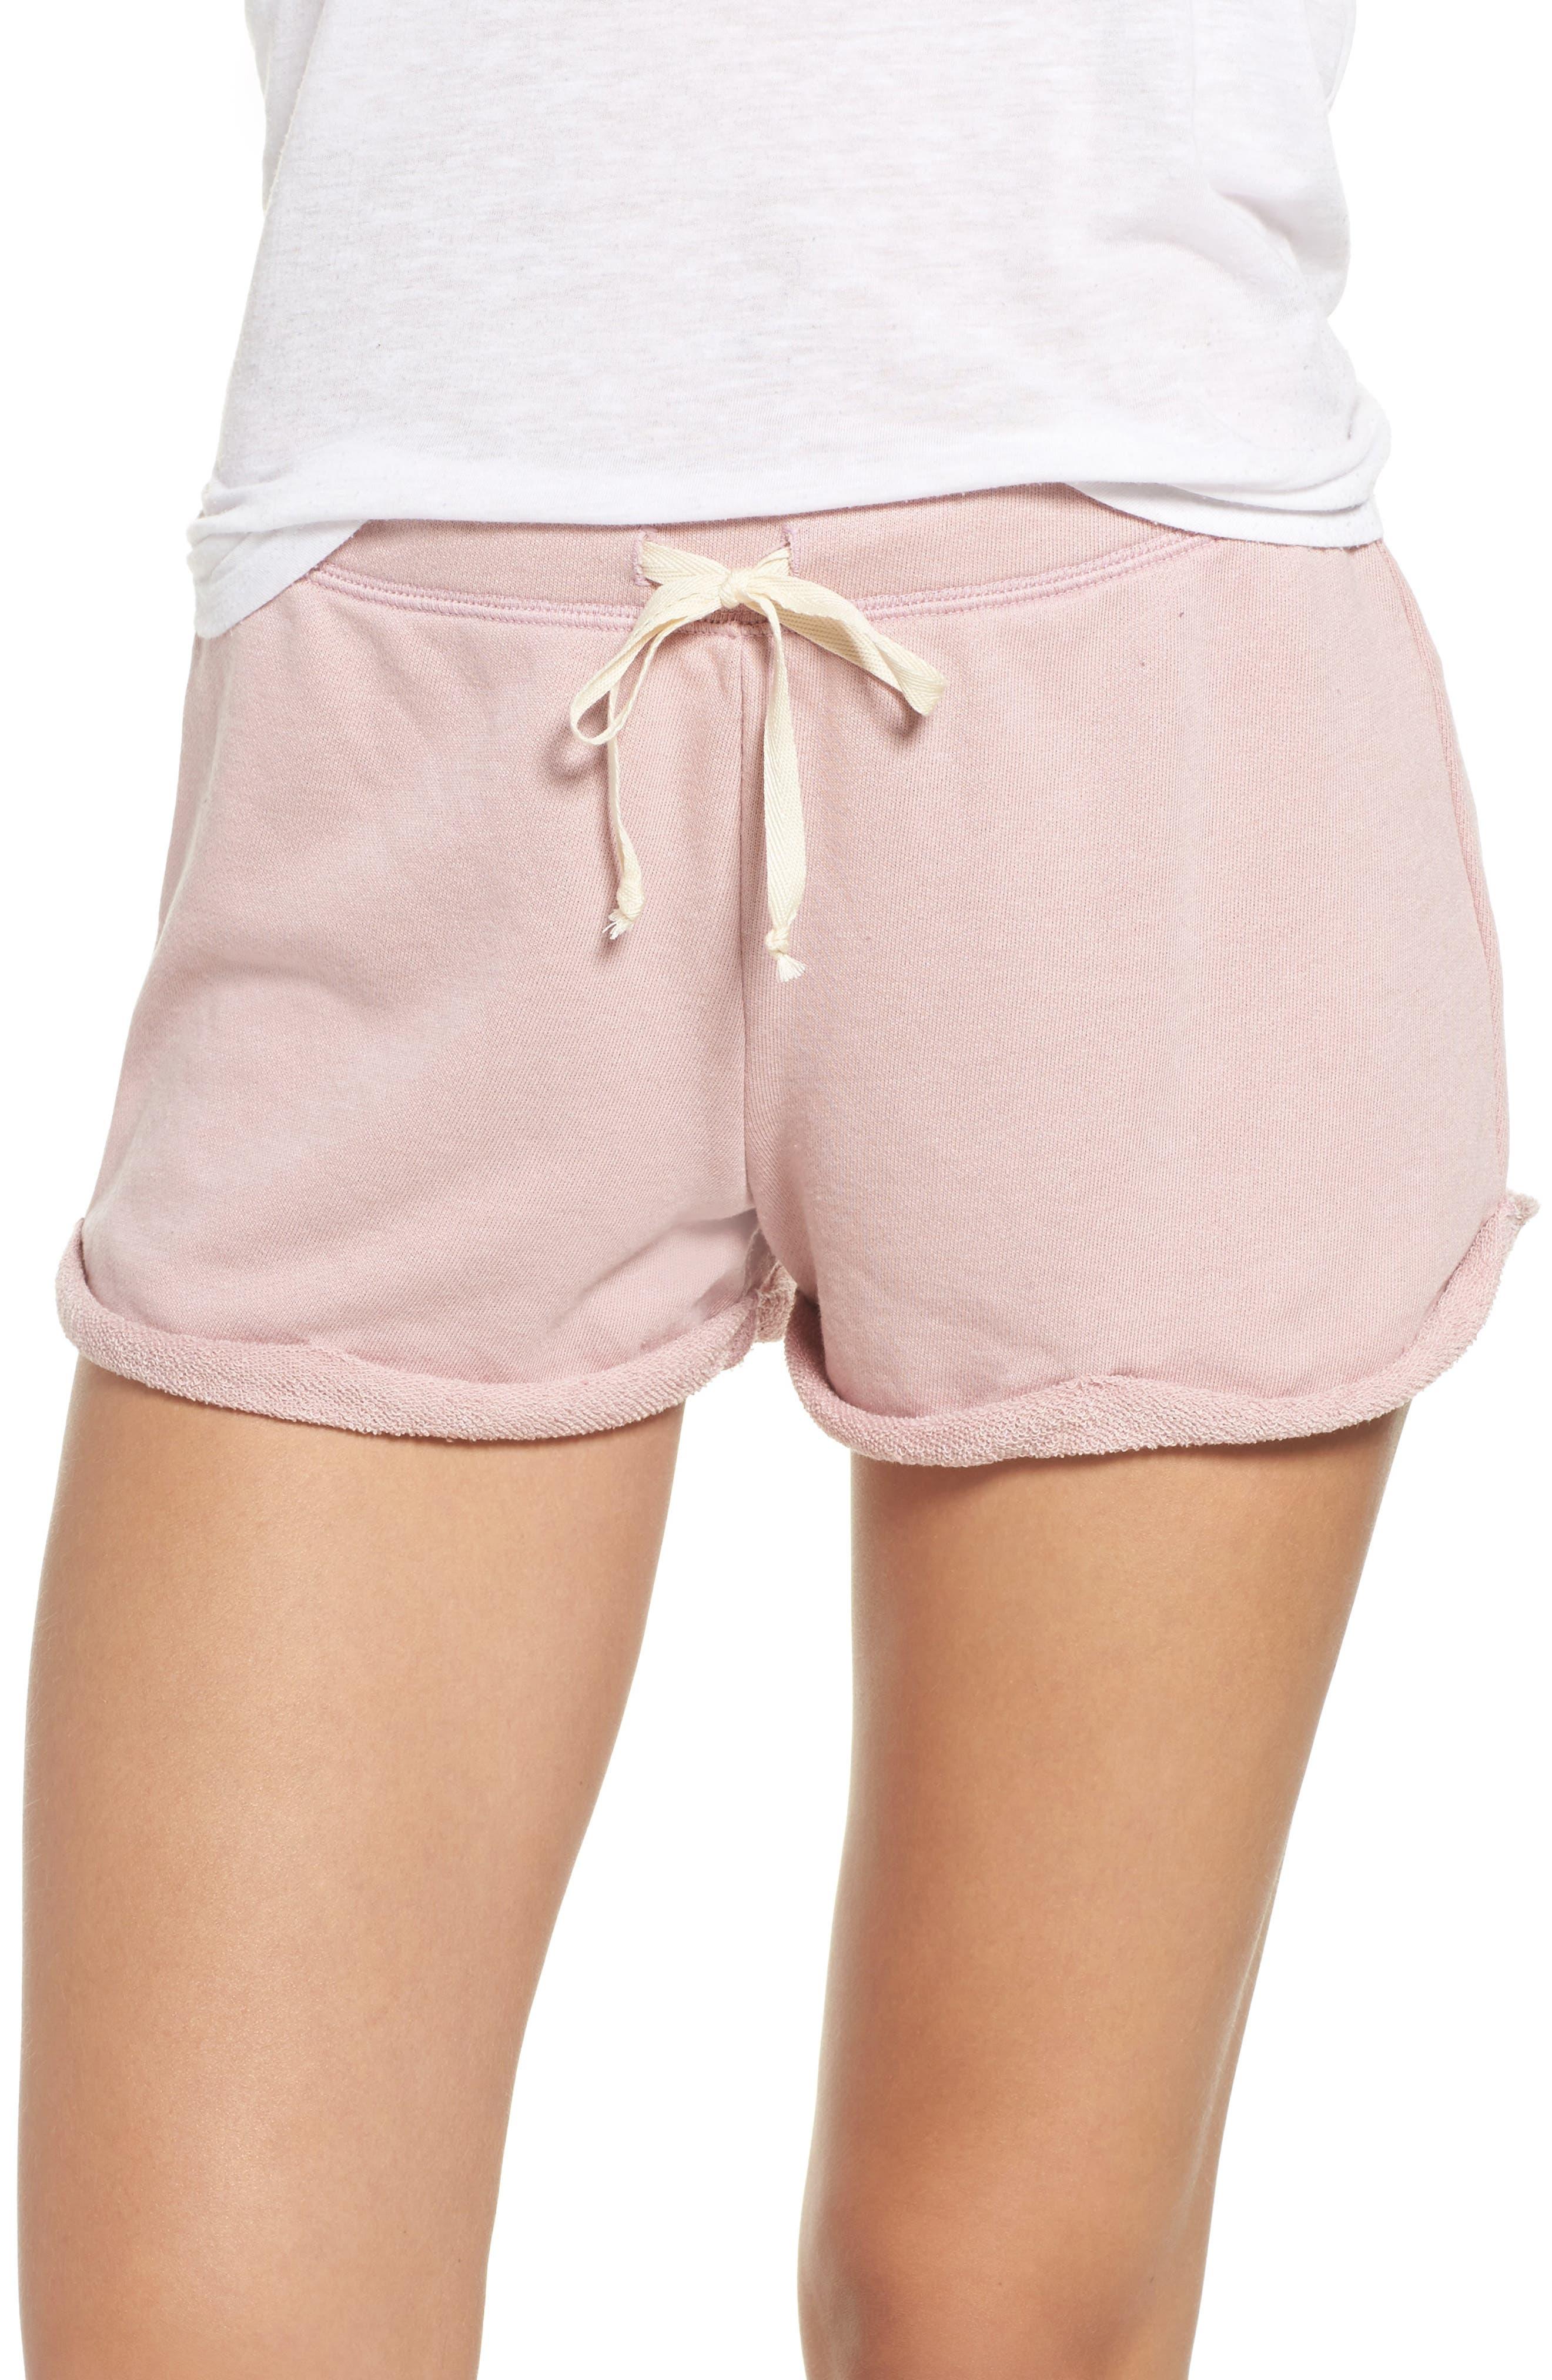 Lounge Shorts,                         Main,                         color, Silk